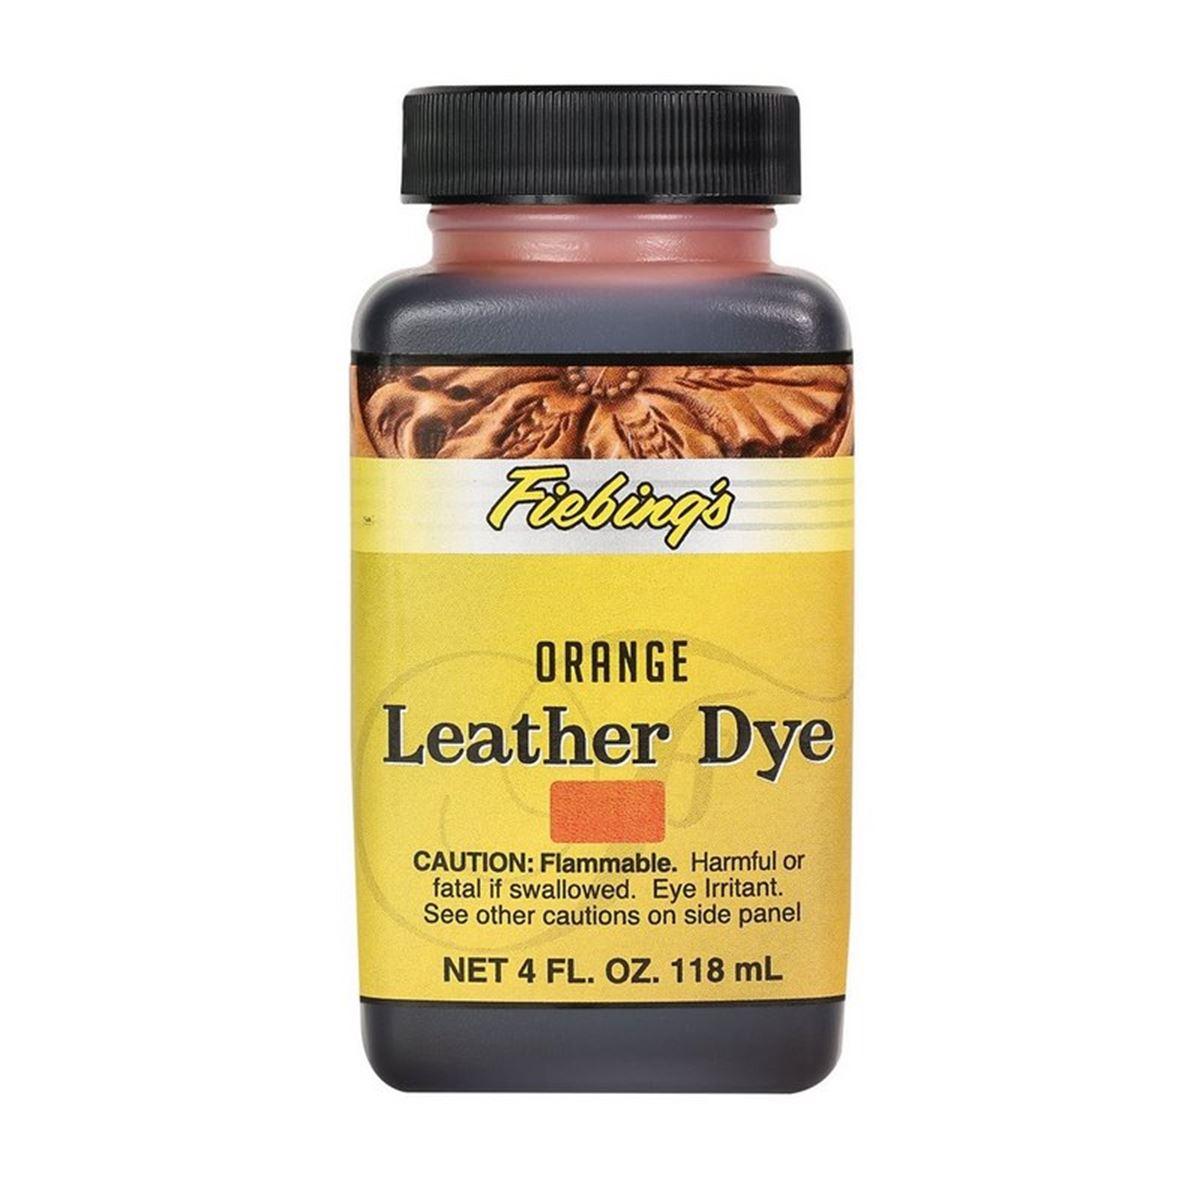 Teinture pour cuir FIEBING'S Leather dye - ORANGE